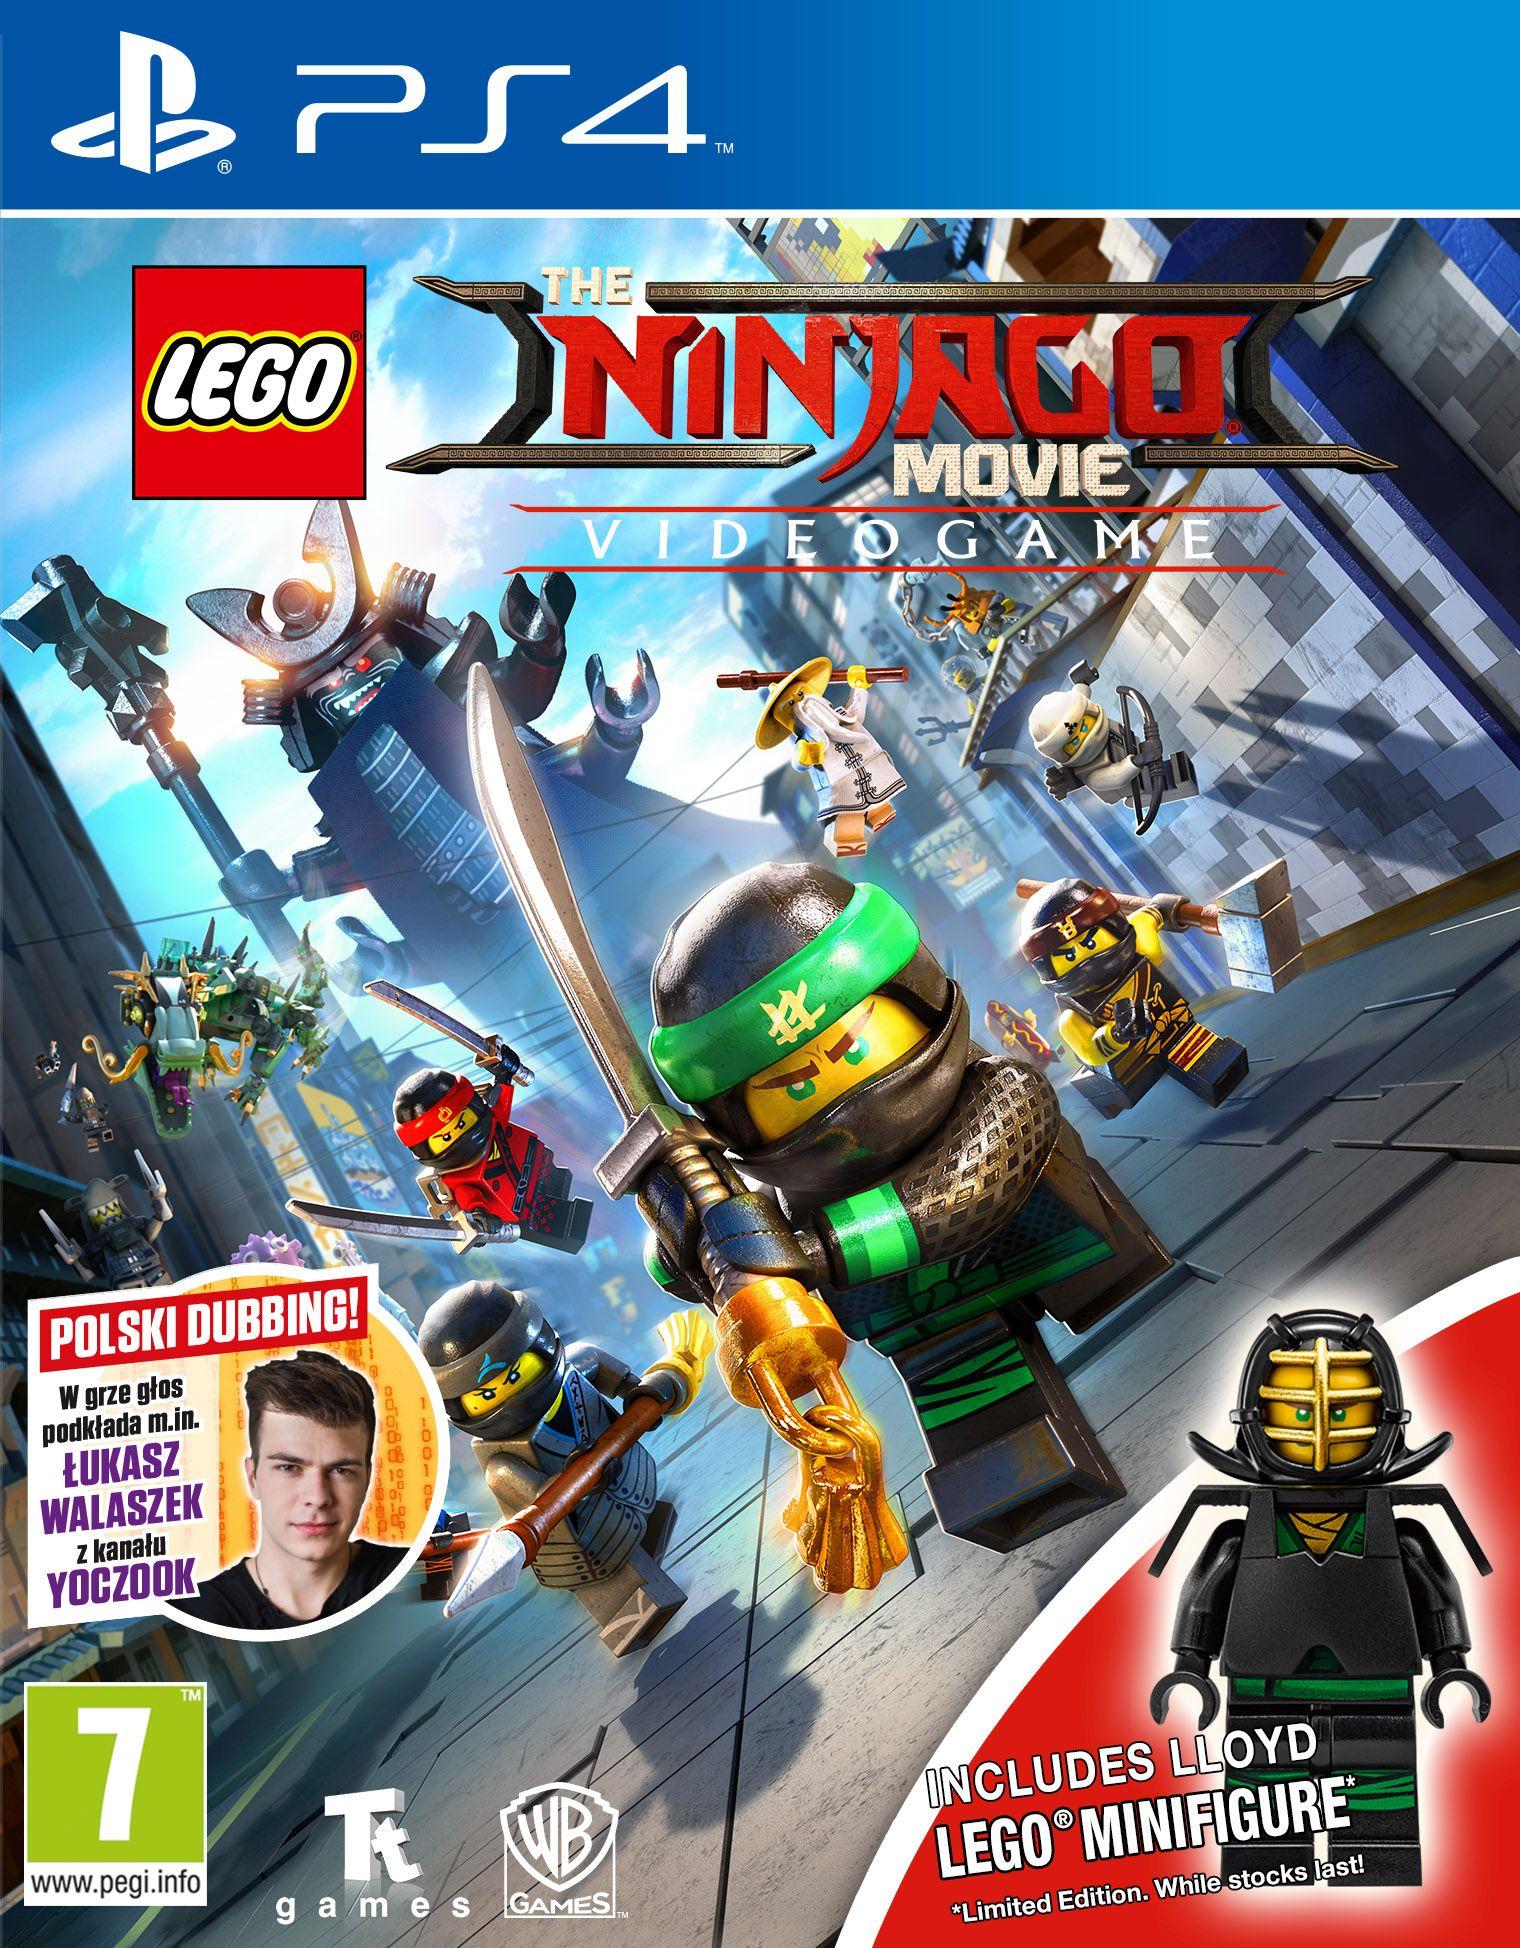 LEGO Ninjago Movie - Gra wideo